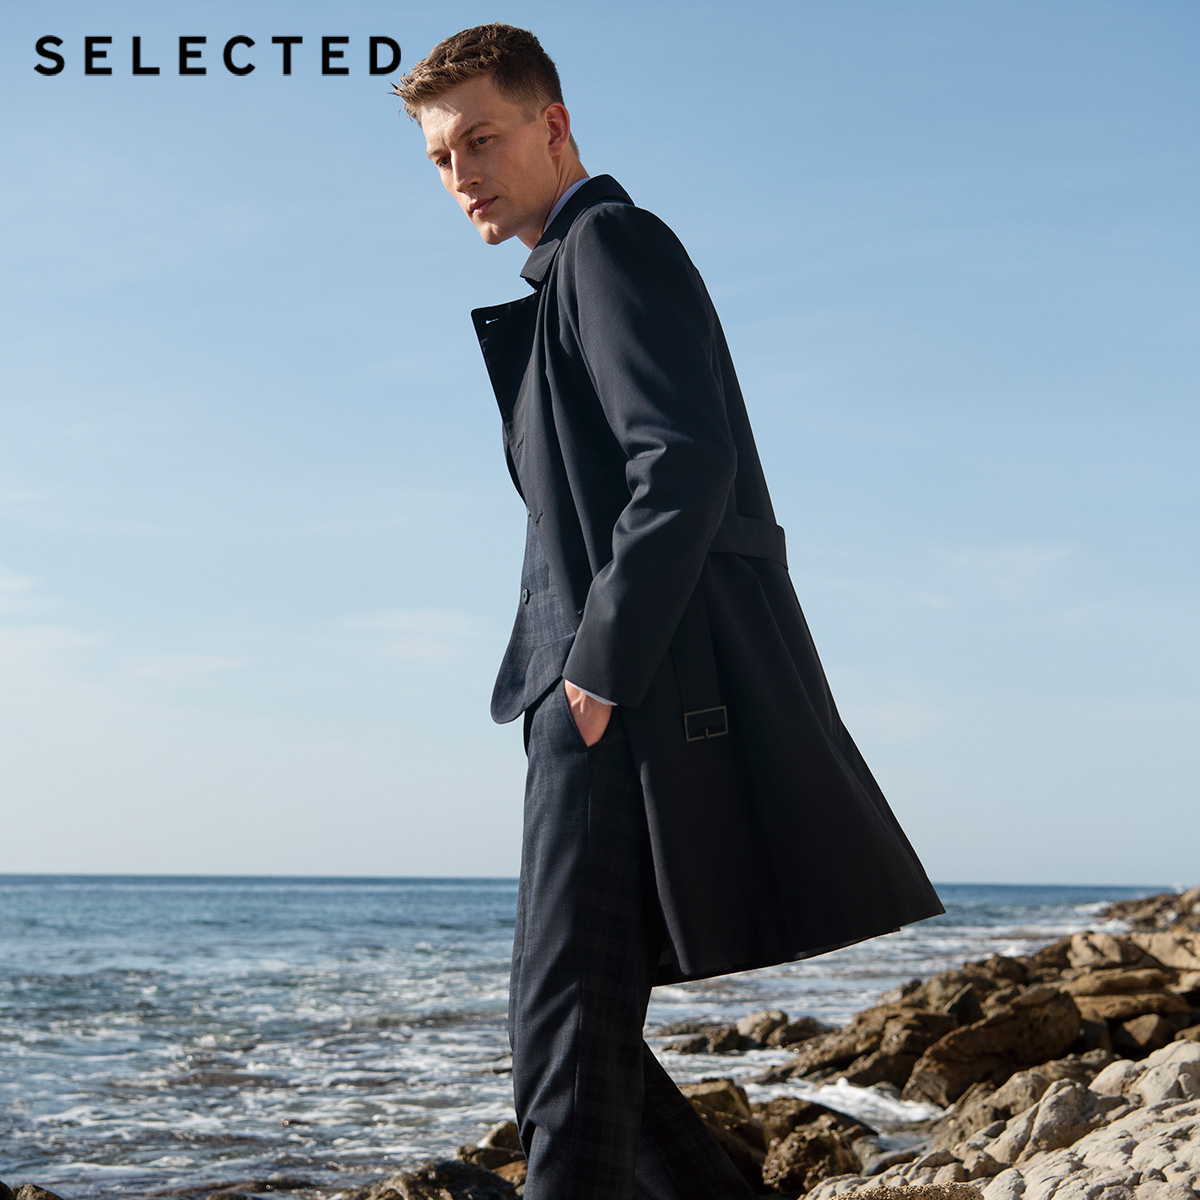 SELECTED Men's Spring Regular Fit Medium Length Woolen Coat T|4191OM535